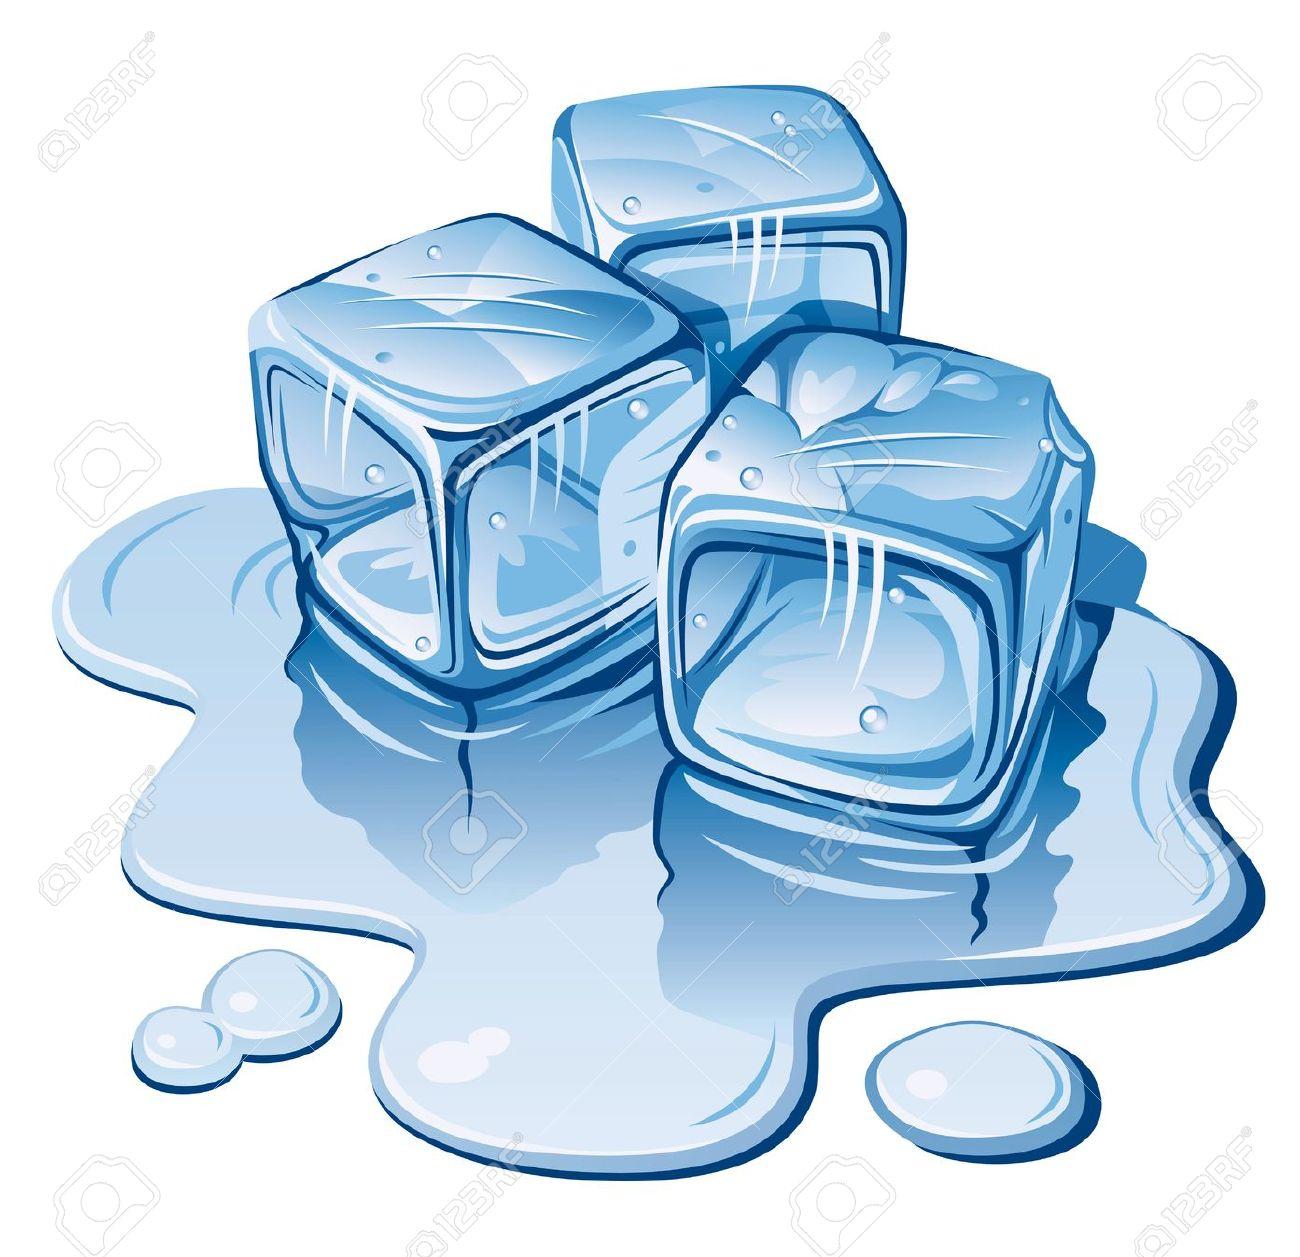 Ice clipart. Clip art free panda